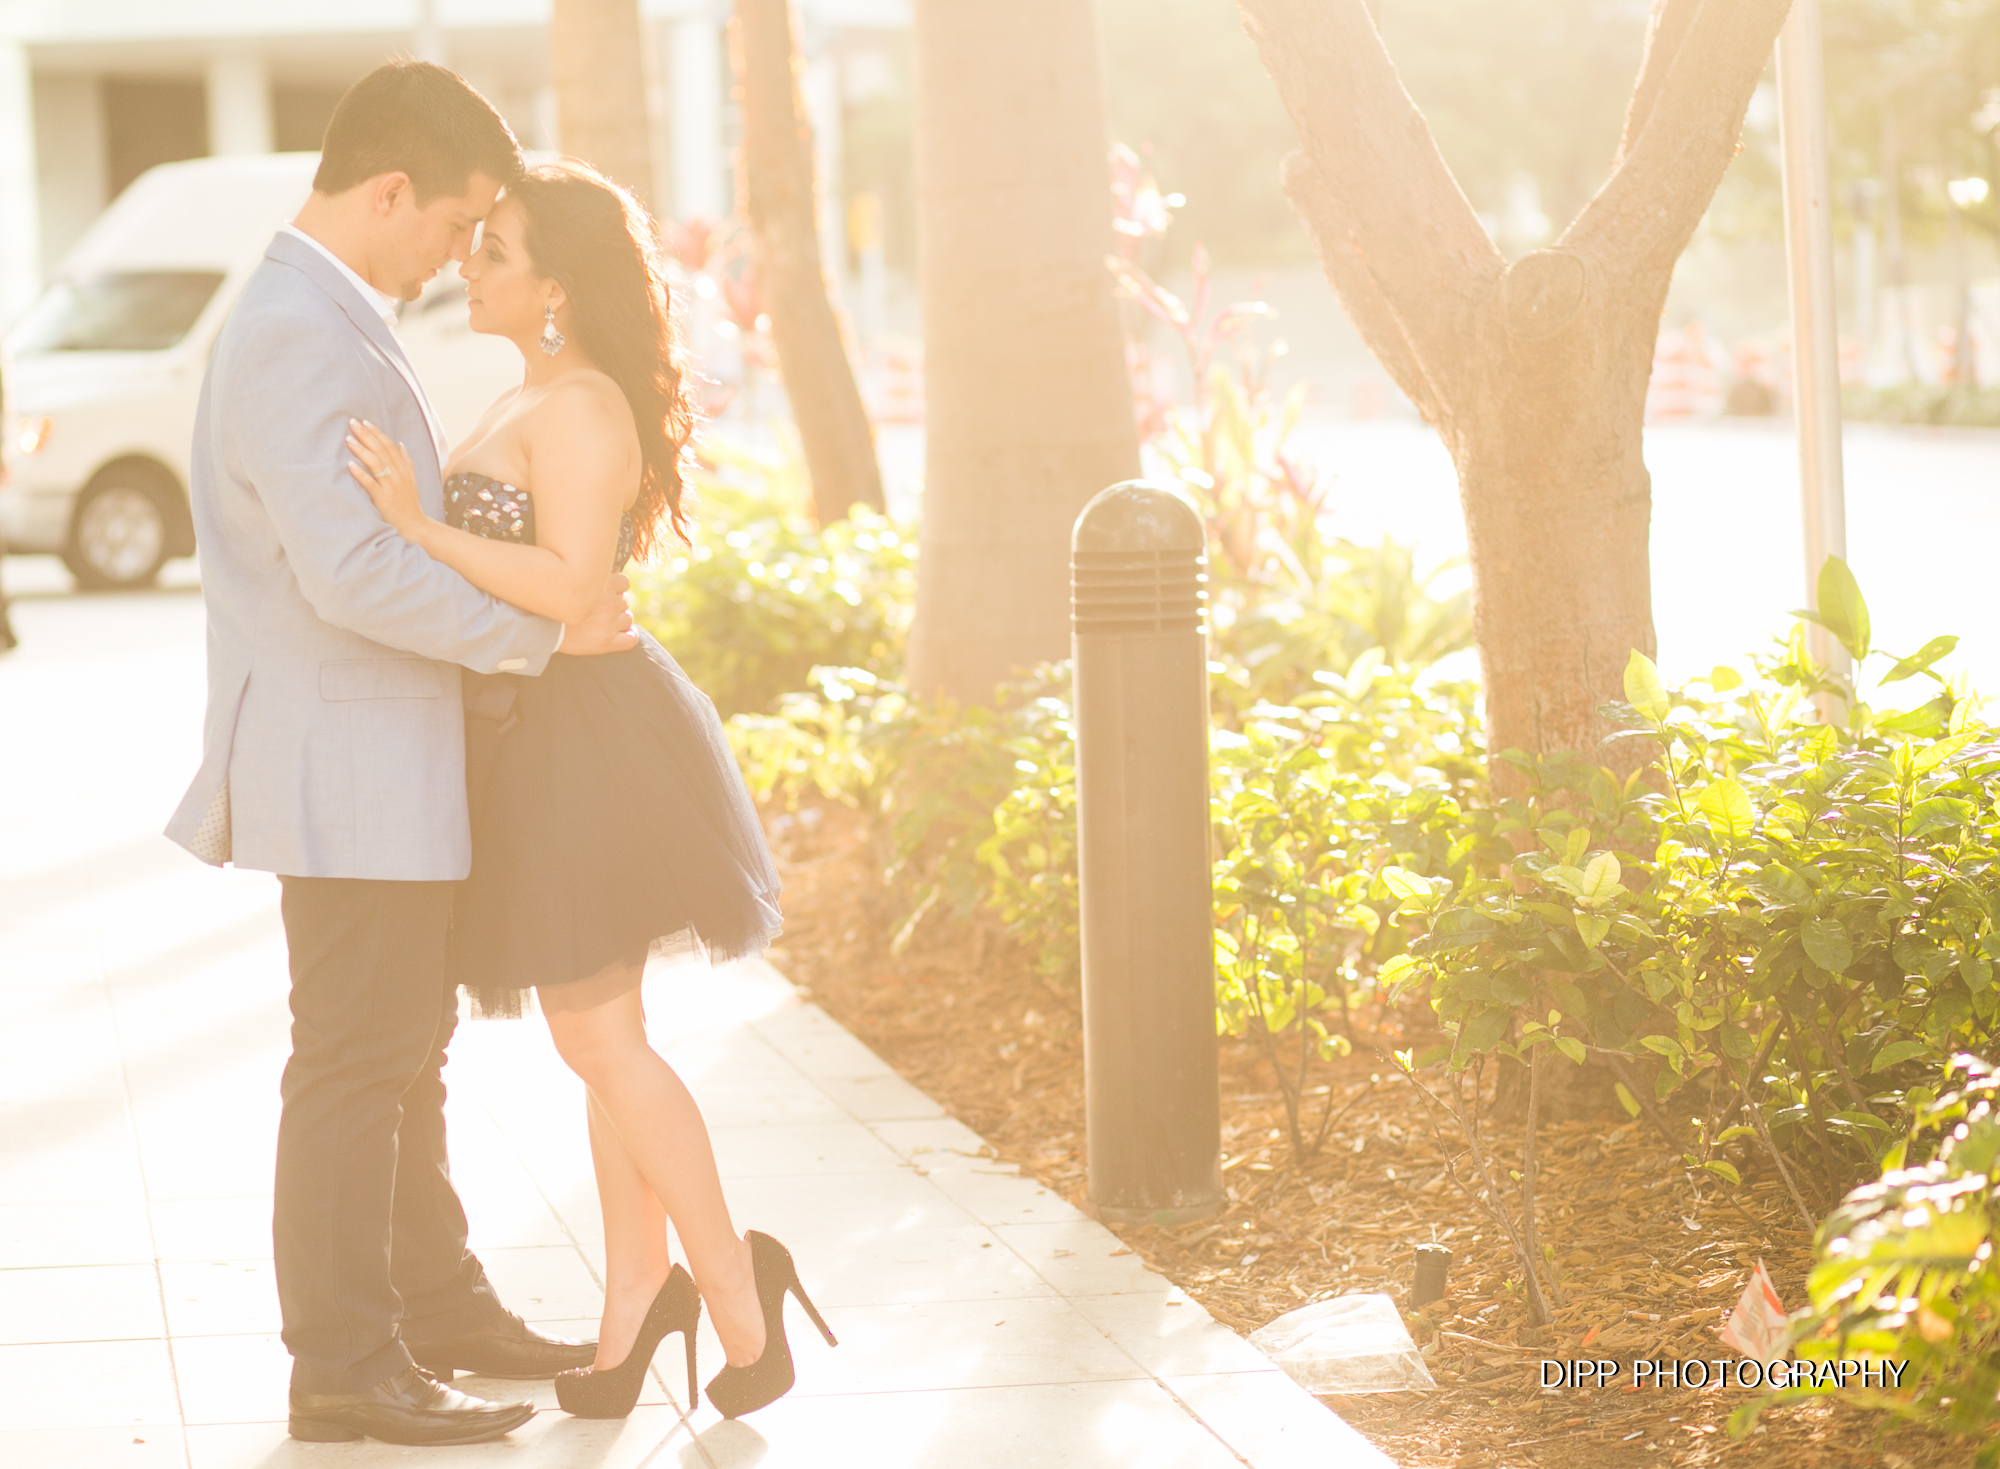 Dipp_2016 Alena & Alfredo ENGAGEMENT-773